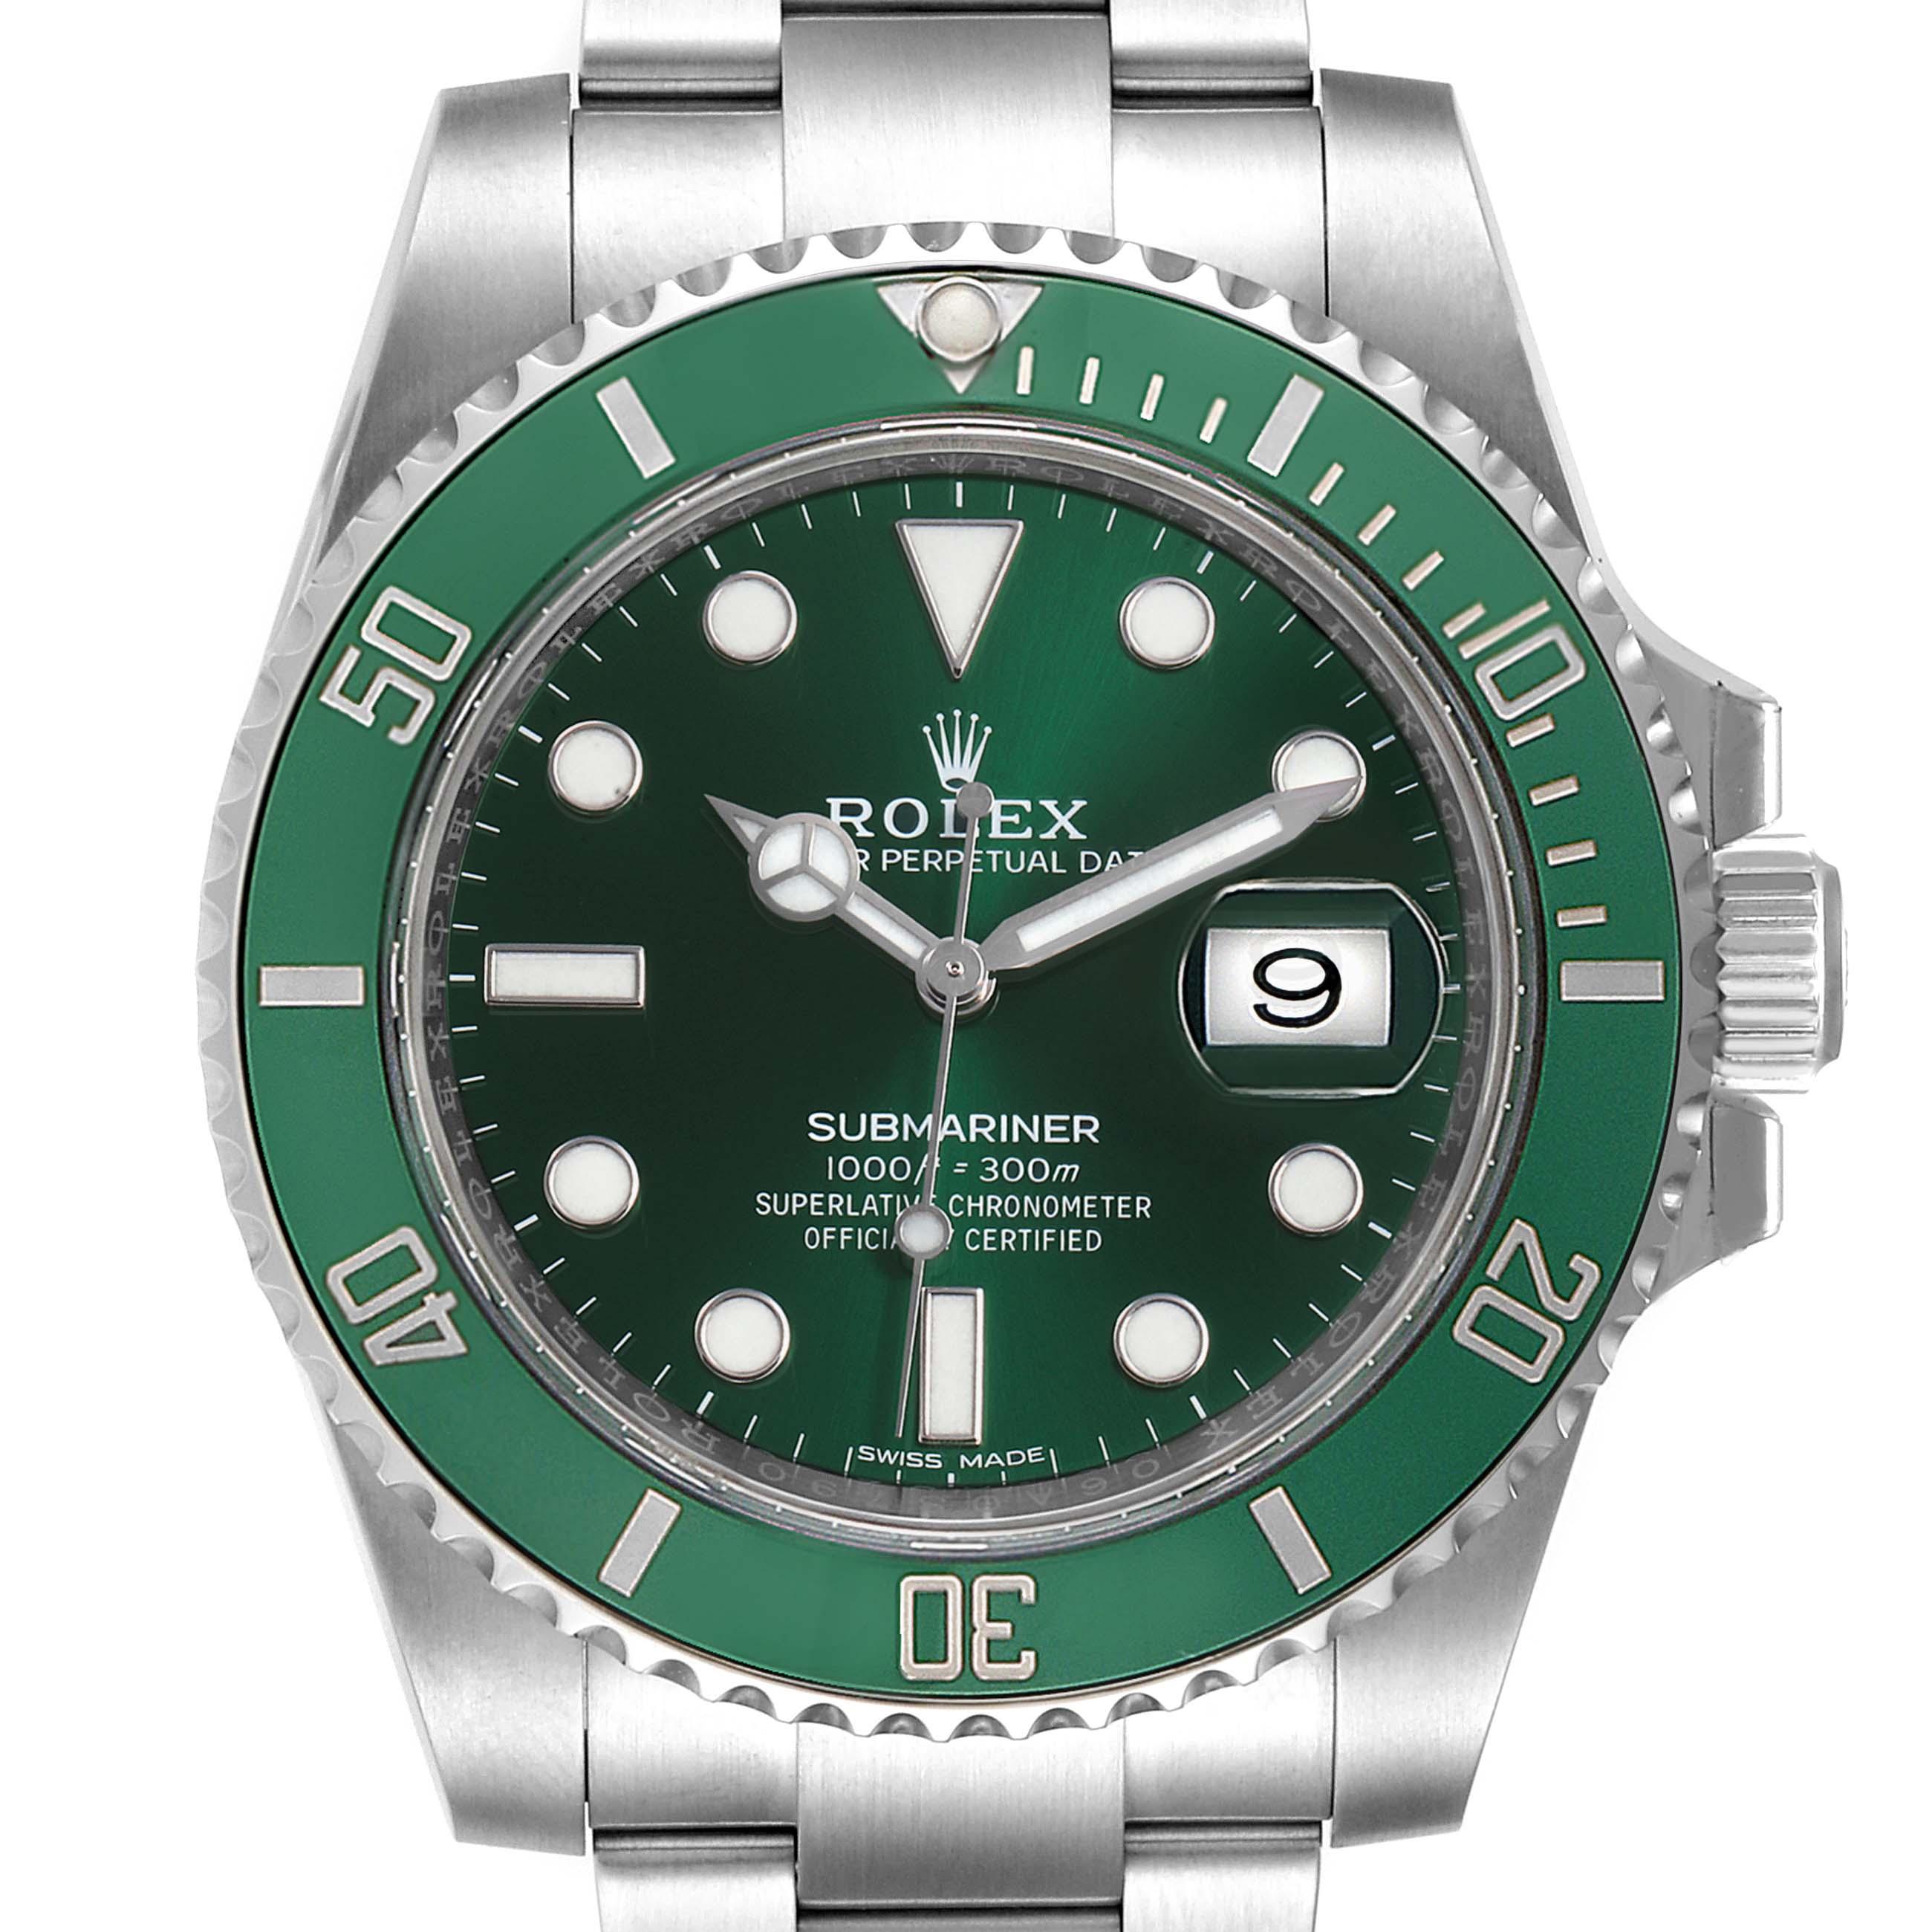 Rolex Submariner Hulk Green Dial Bezel Mens Watch 116610LV Unworn